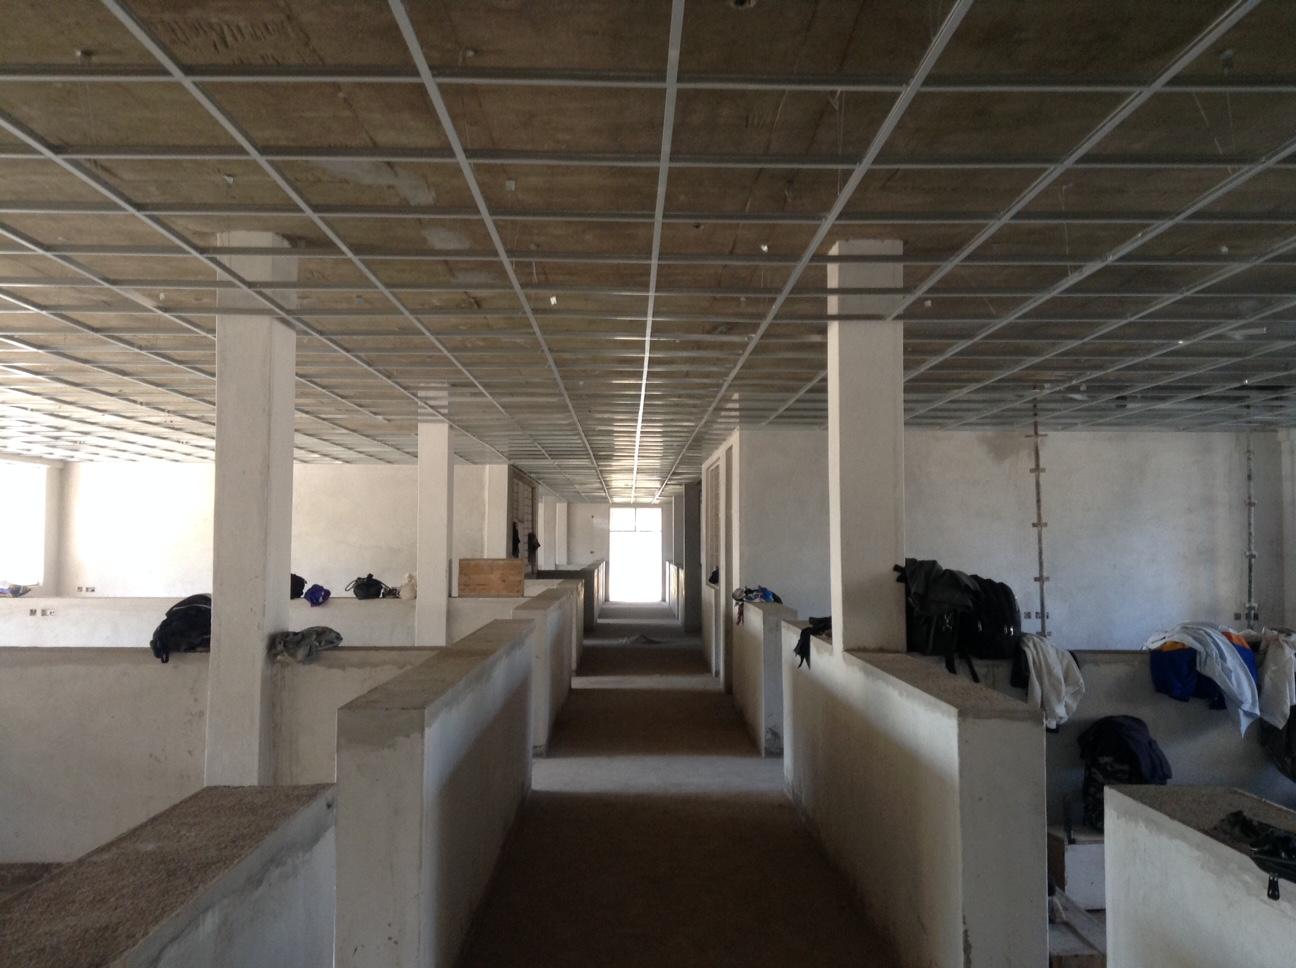 Interior Hallways - July 2016